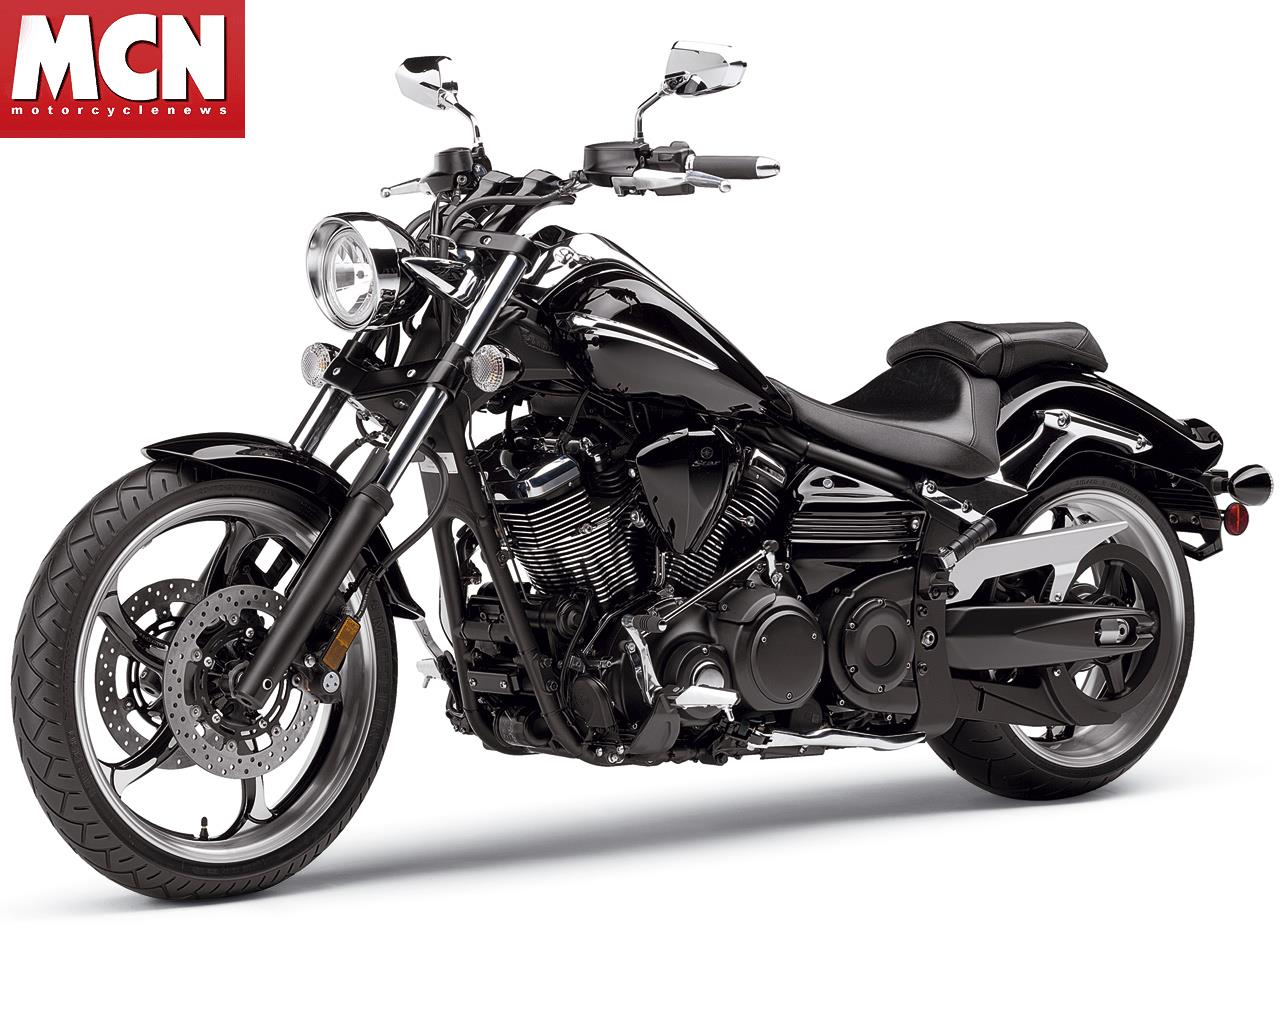 new 2008 yamaha xv1900 raider custom cruiser motorcycle mcn. Black Bedroom Furniture Sets. Home Design Ideas